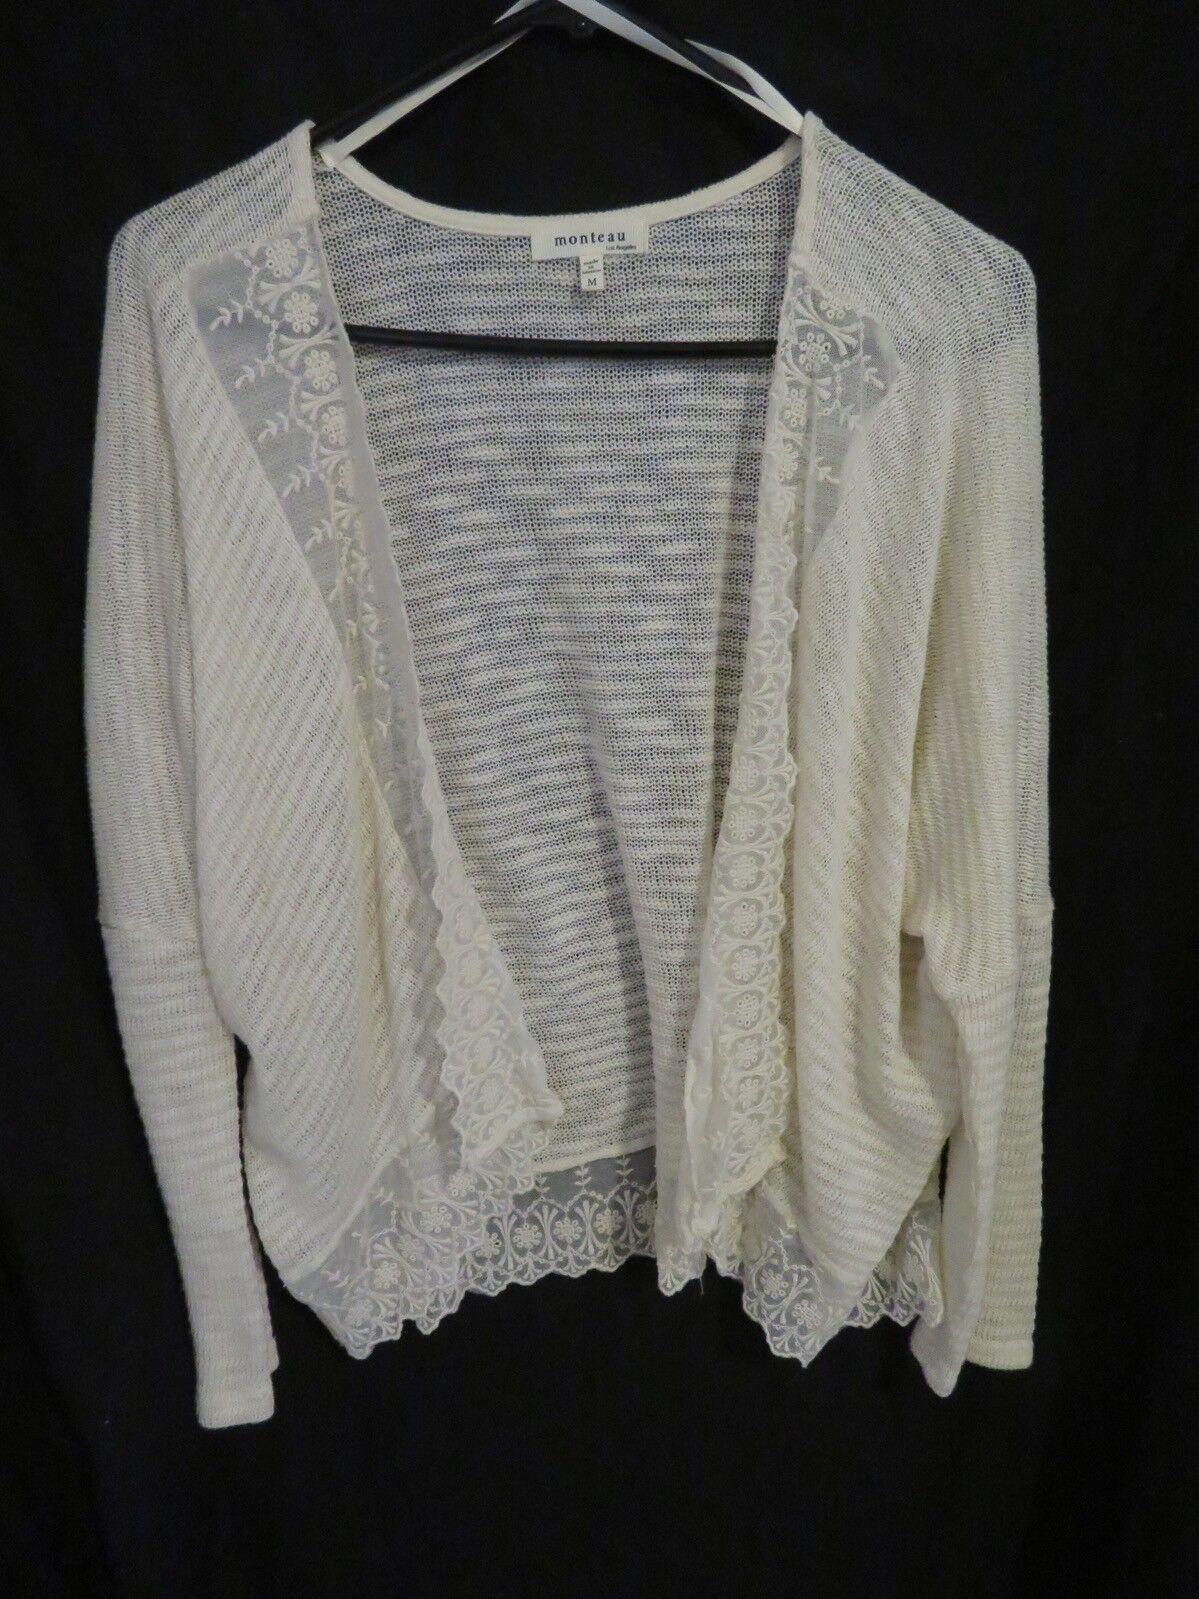 Women's Monteau Open Front Cream Sweater Cover Up Lace Trim Top Size Medium